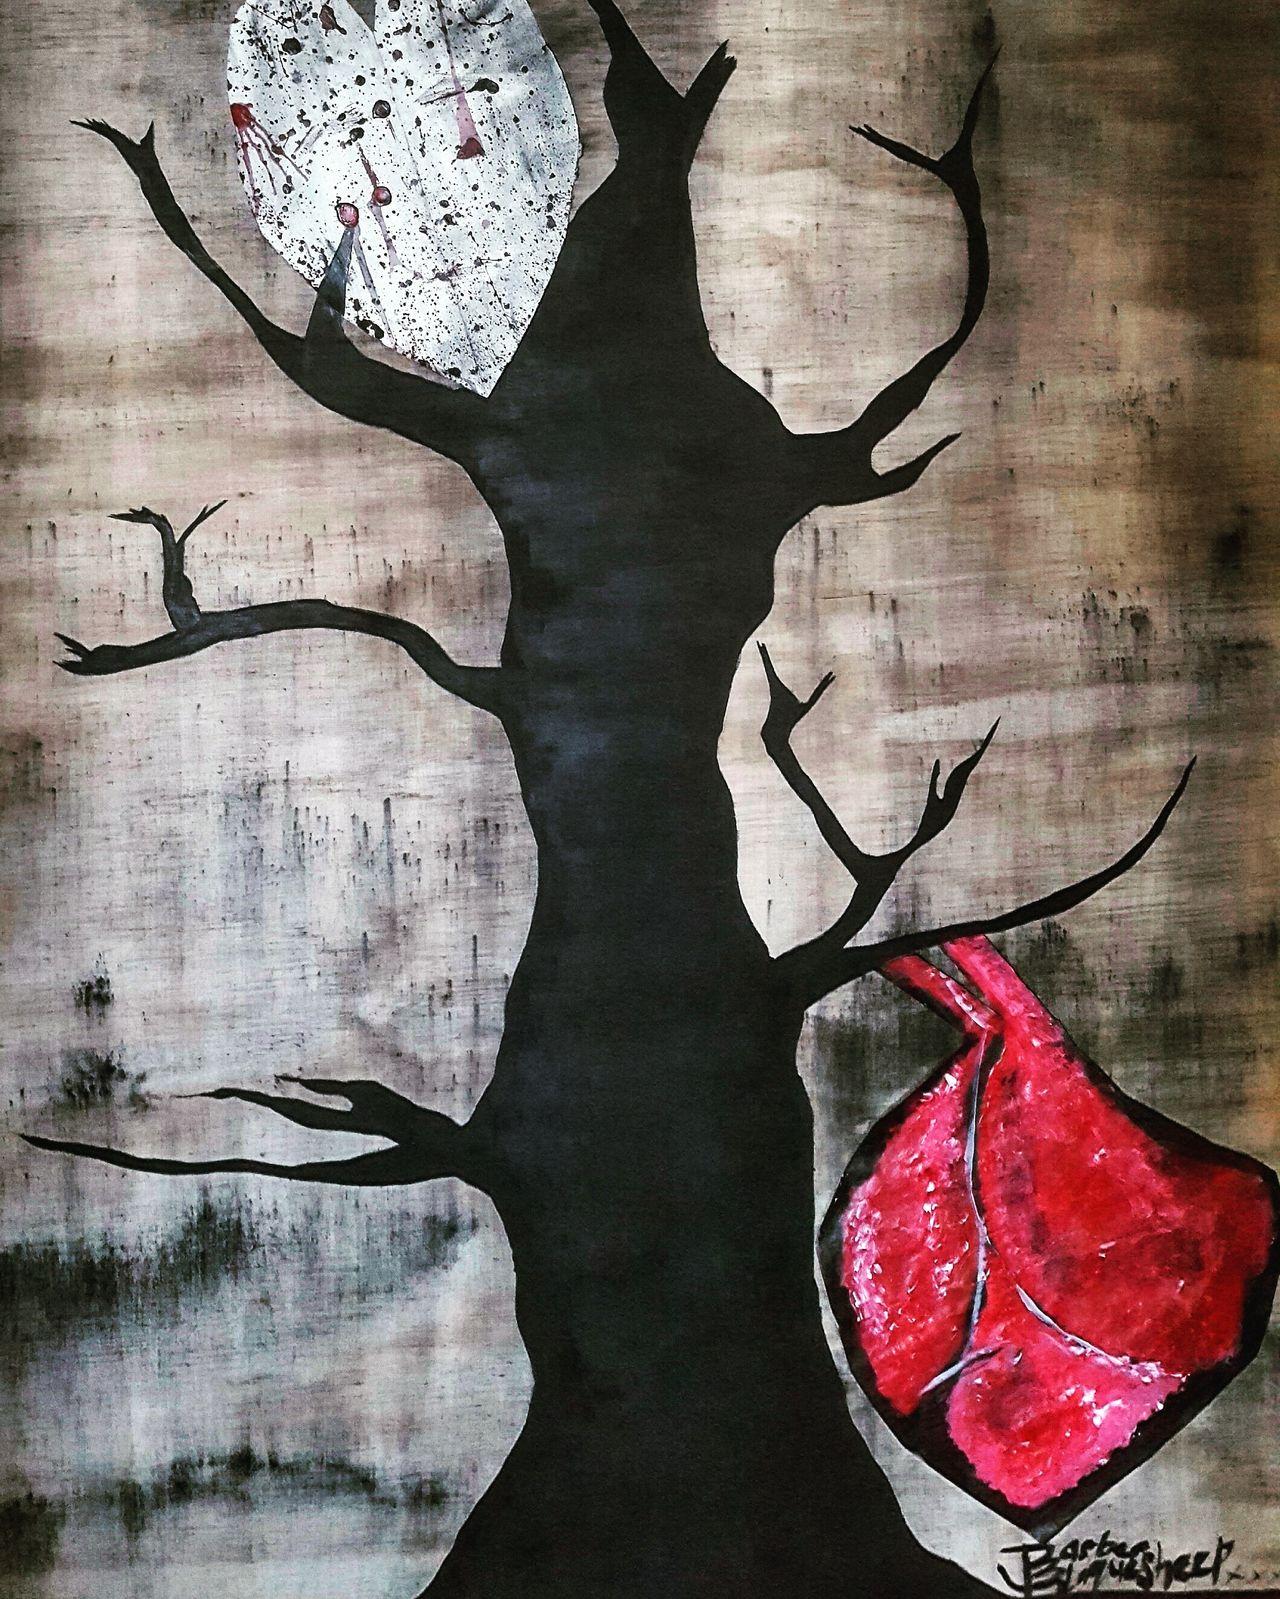 Painting Art ArtWork Paintings Paint Heart Tree Trees Tree Spirit Tree Spirit Portrait Mixedmedia Silhouette